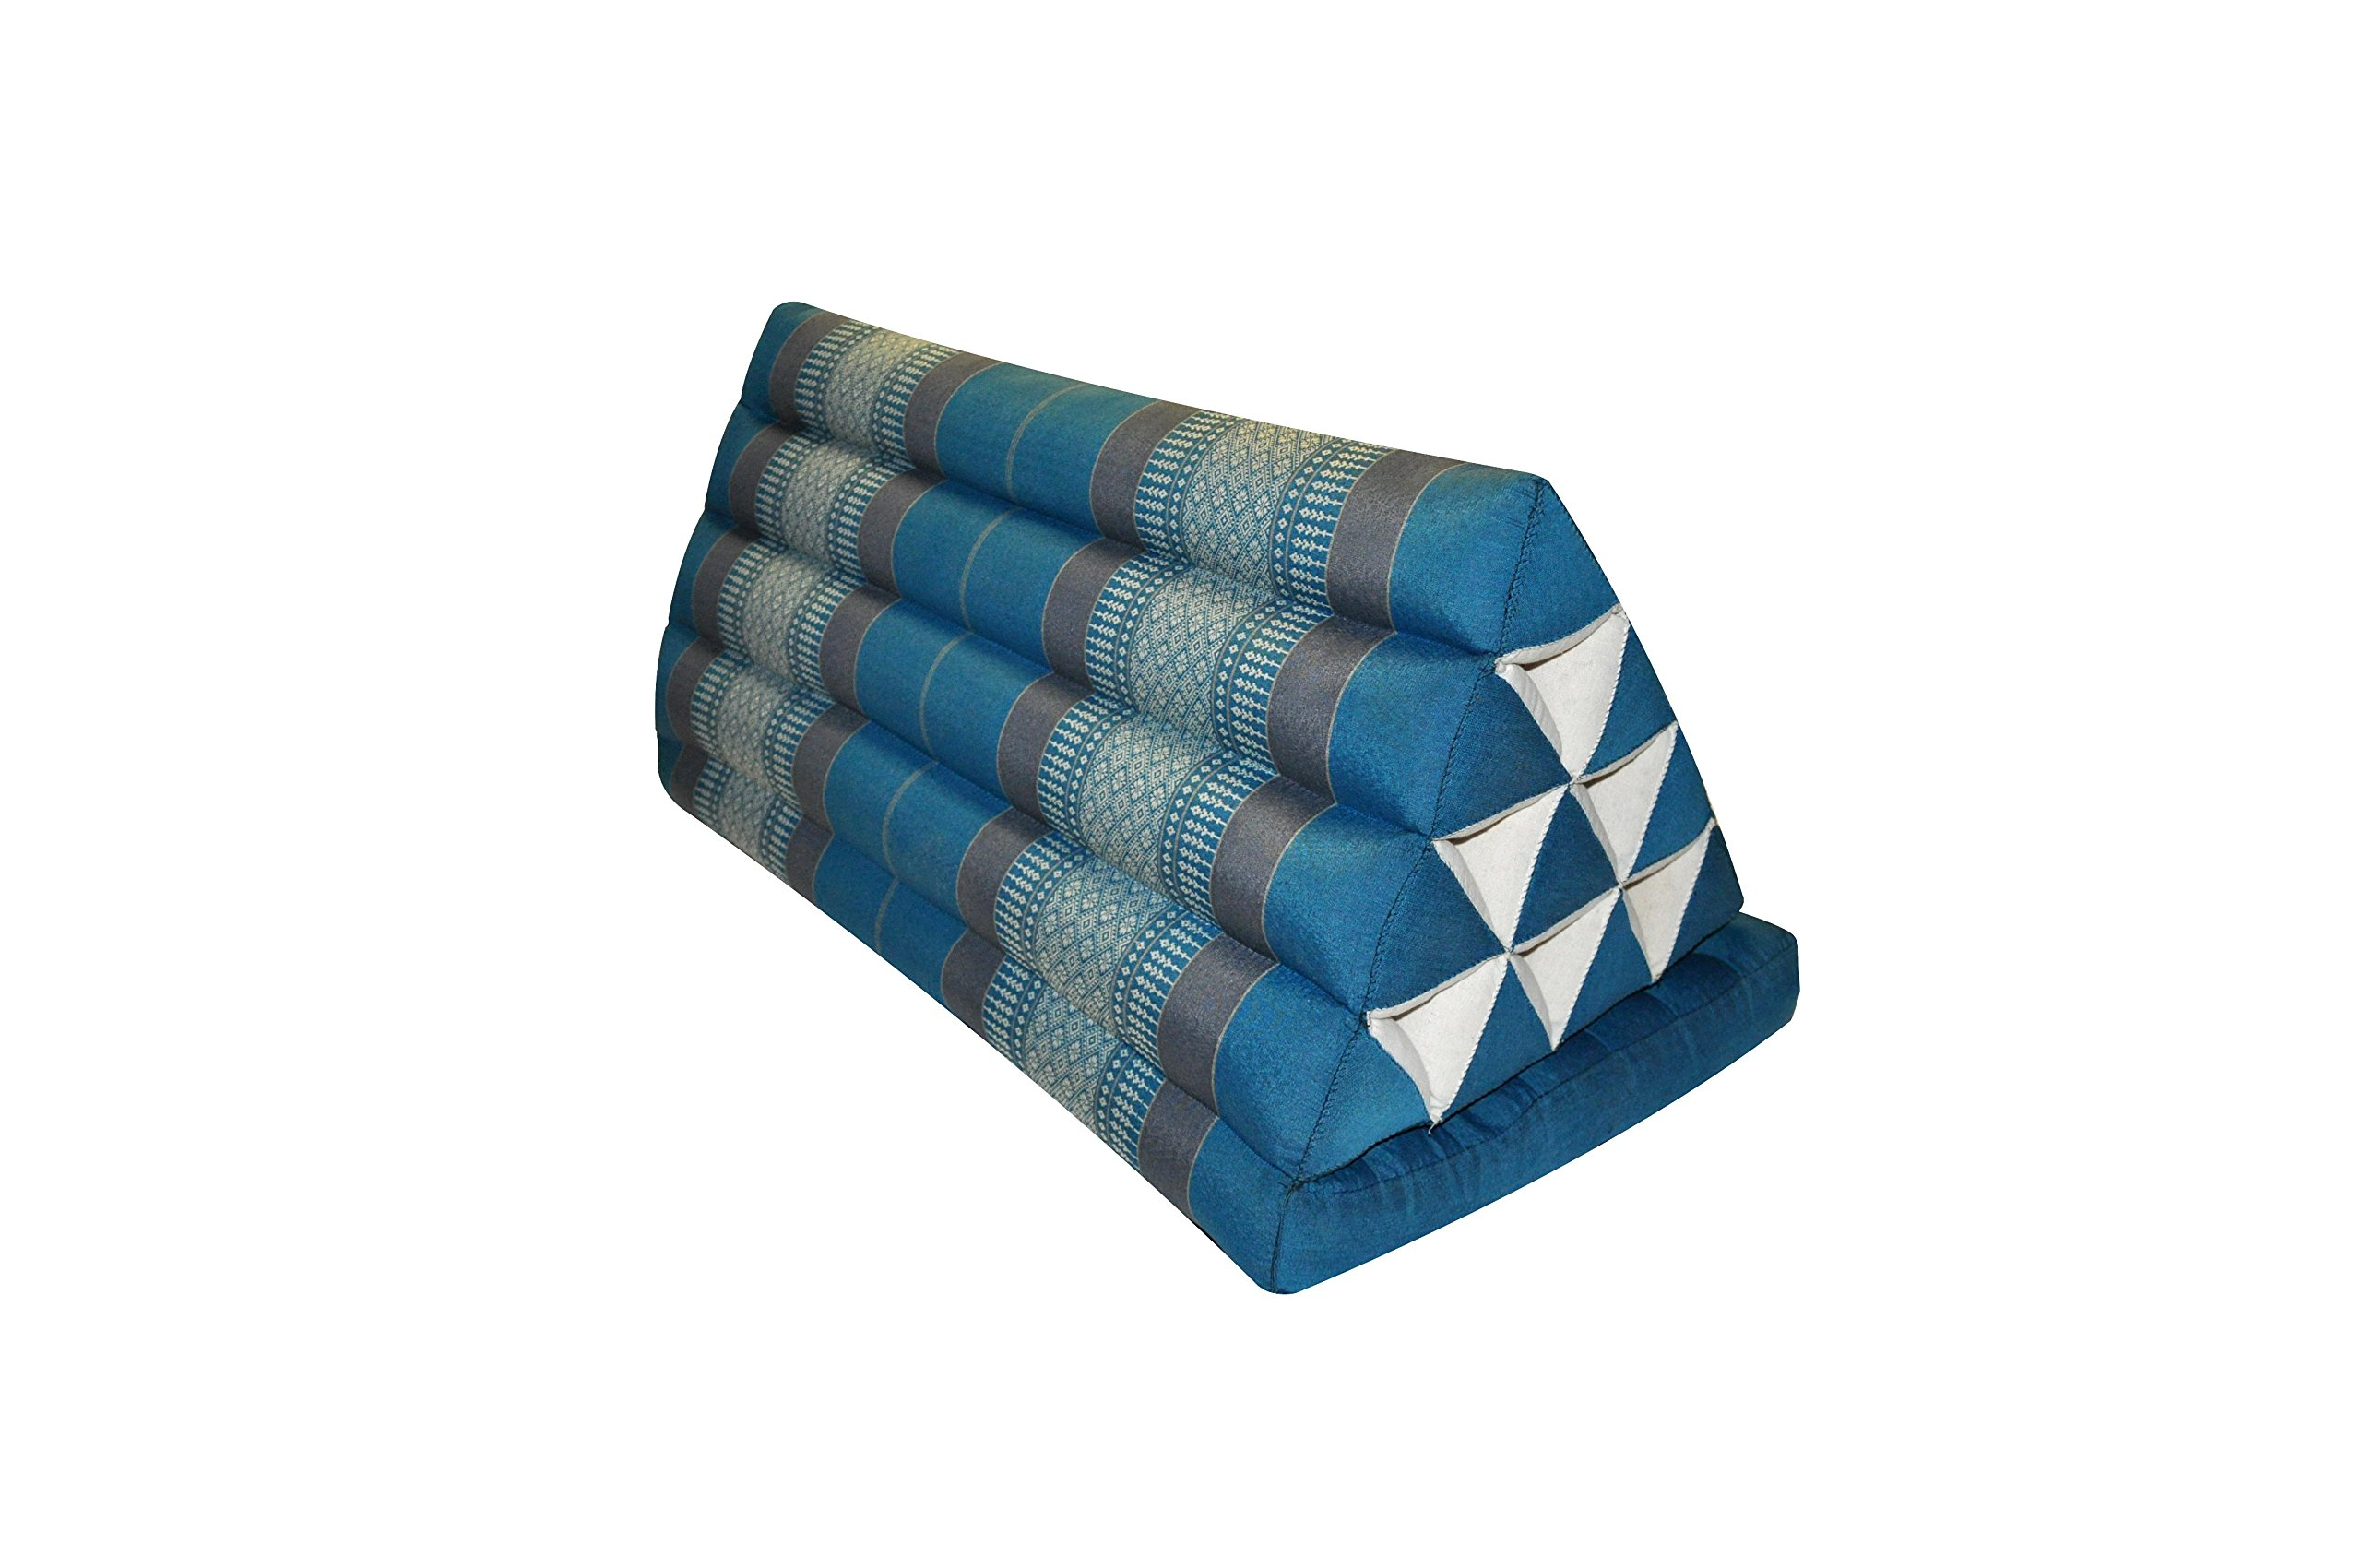 Thai triangle cushion XXL, with 1 folding seat, blue/grey, sofa, relaxation, beach, pool, meditation, yoga, made in Thailand. (82616)